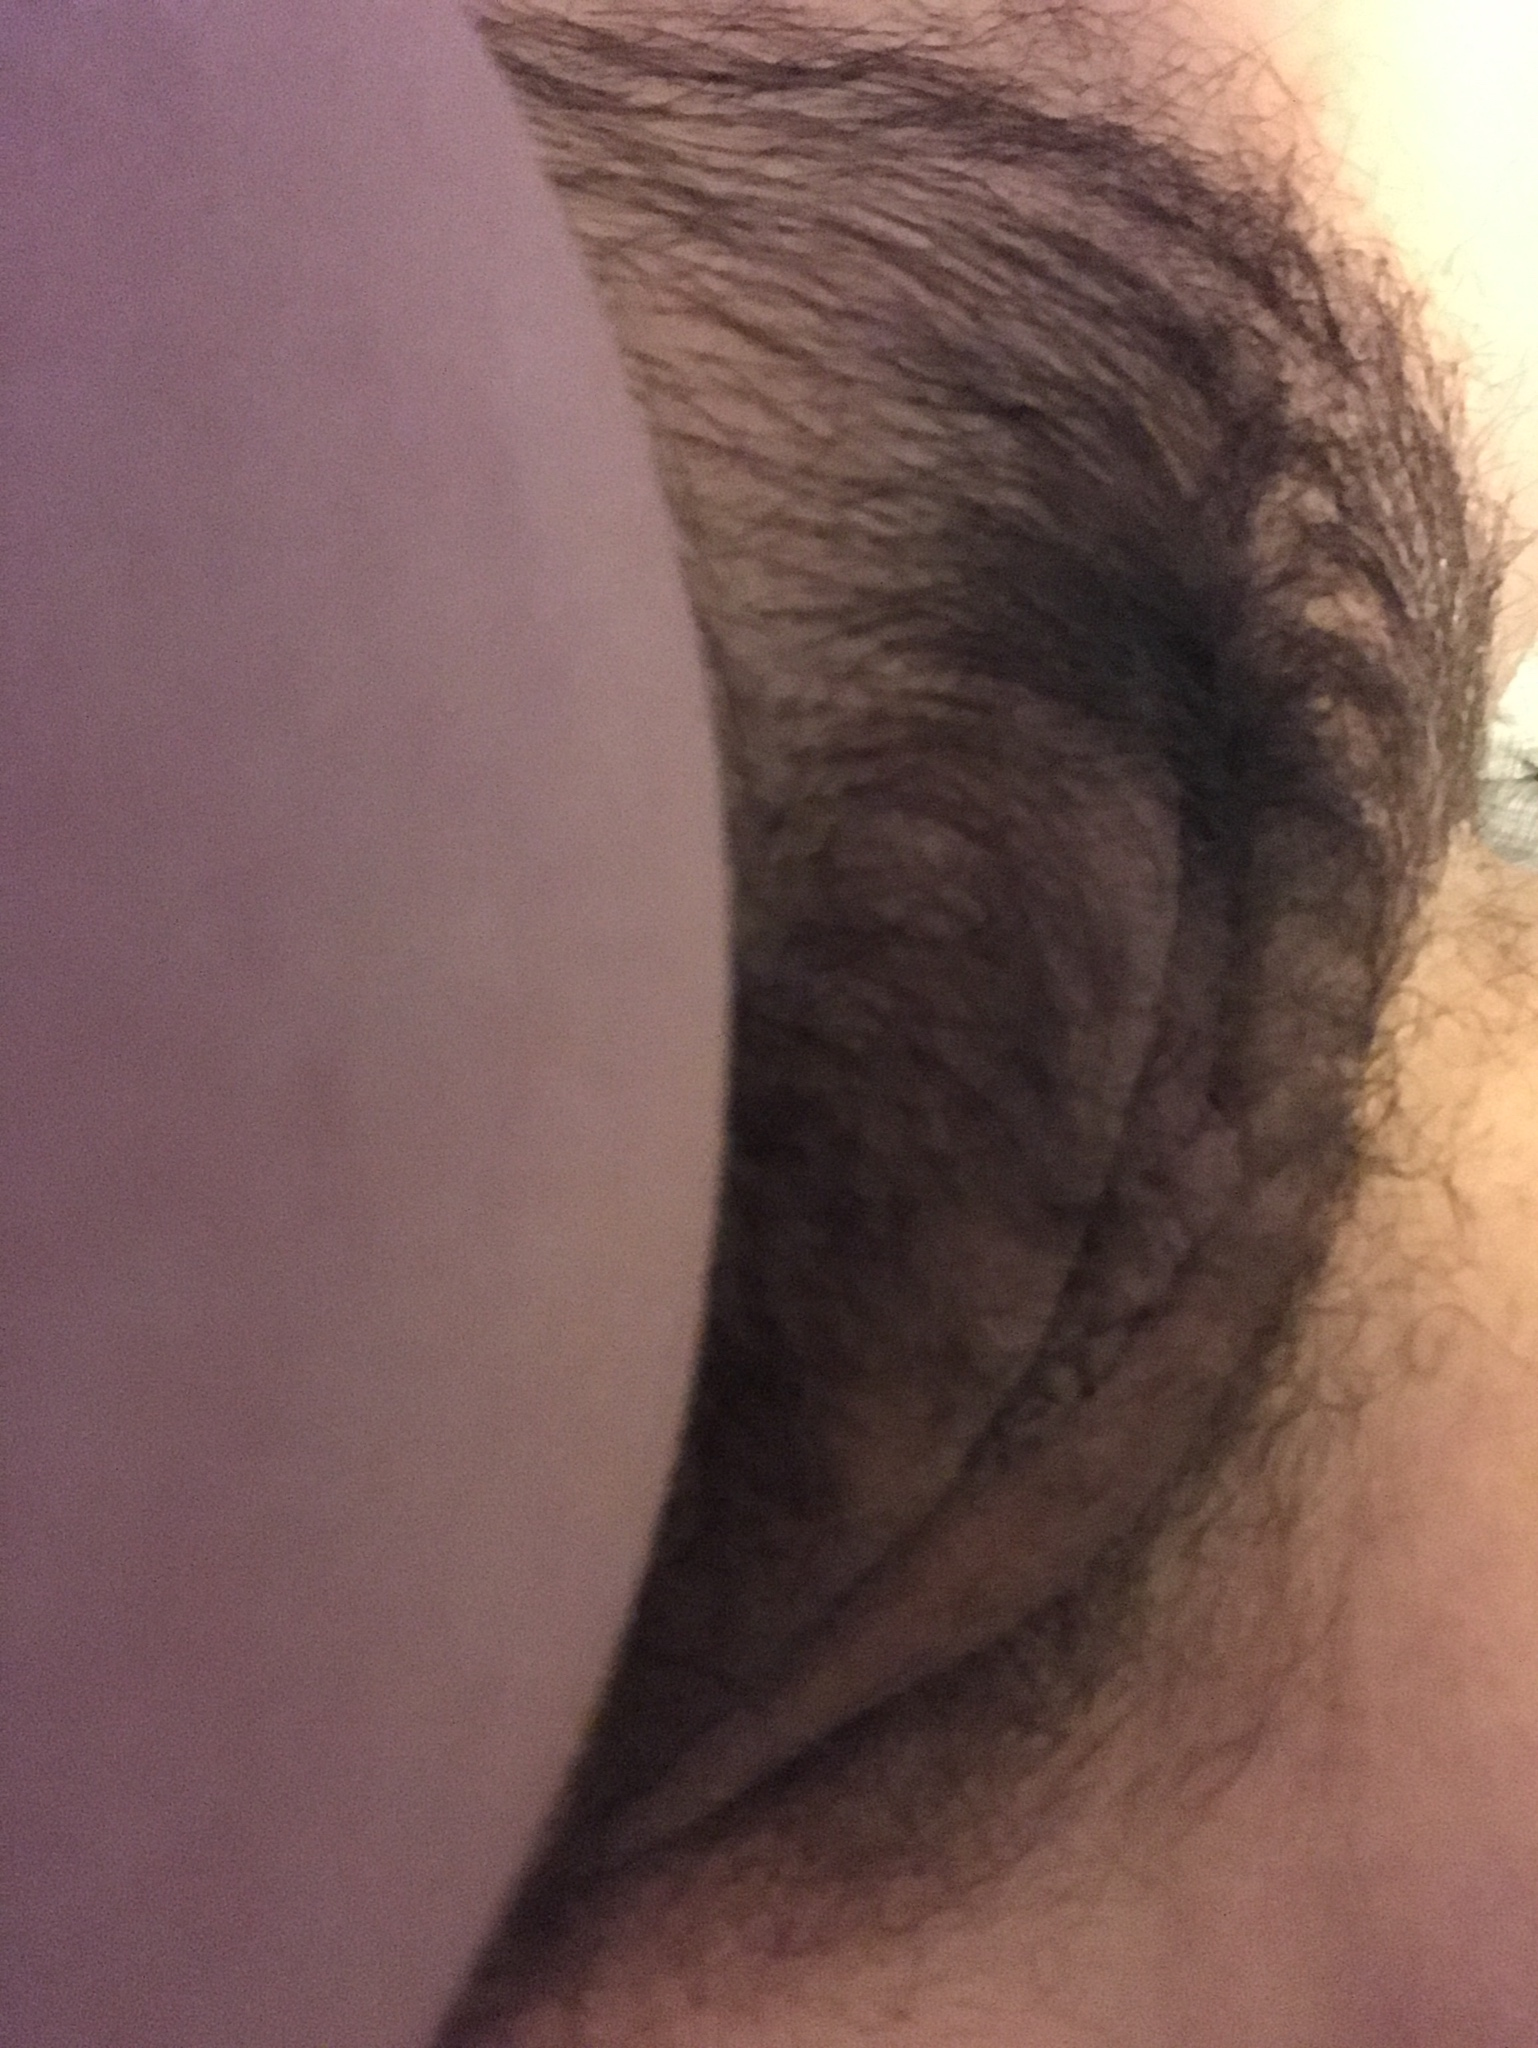 Hairy porno Hairy Girls